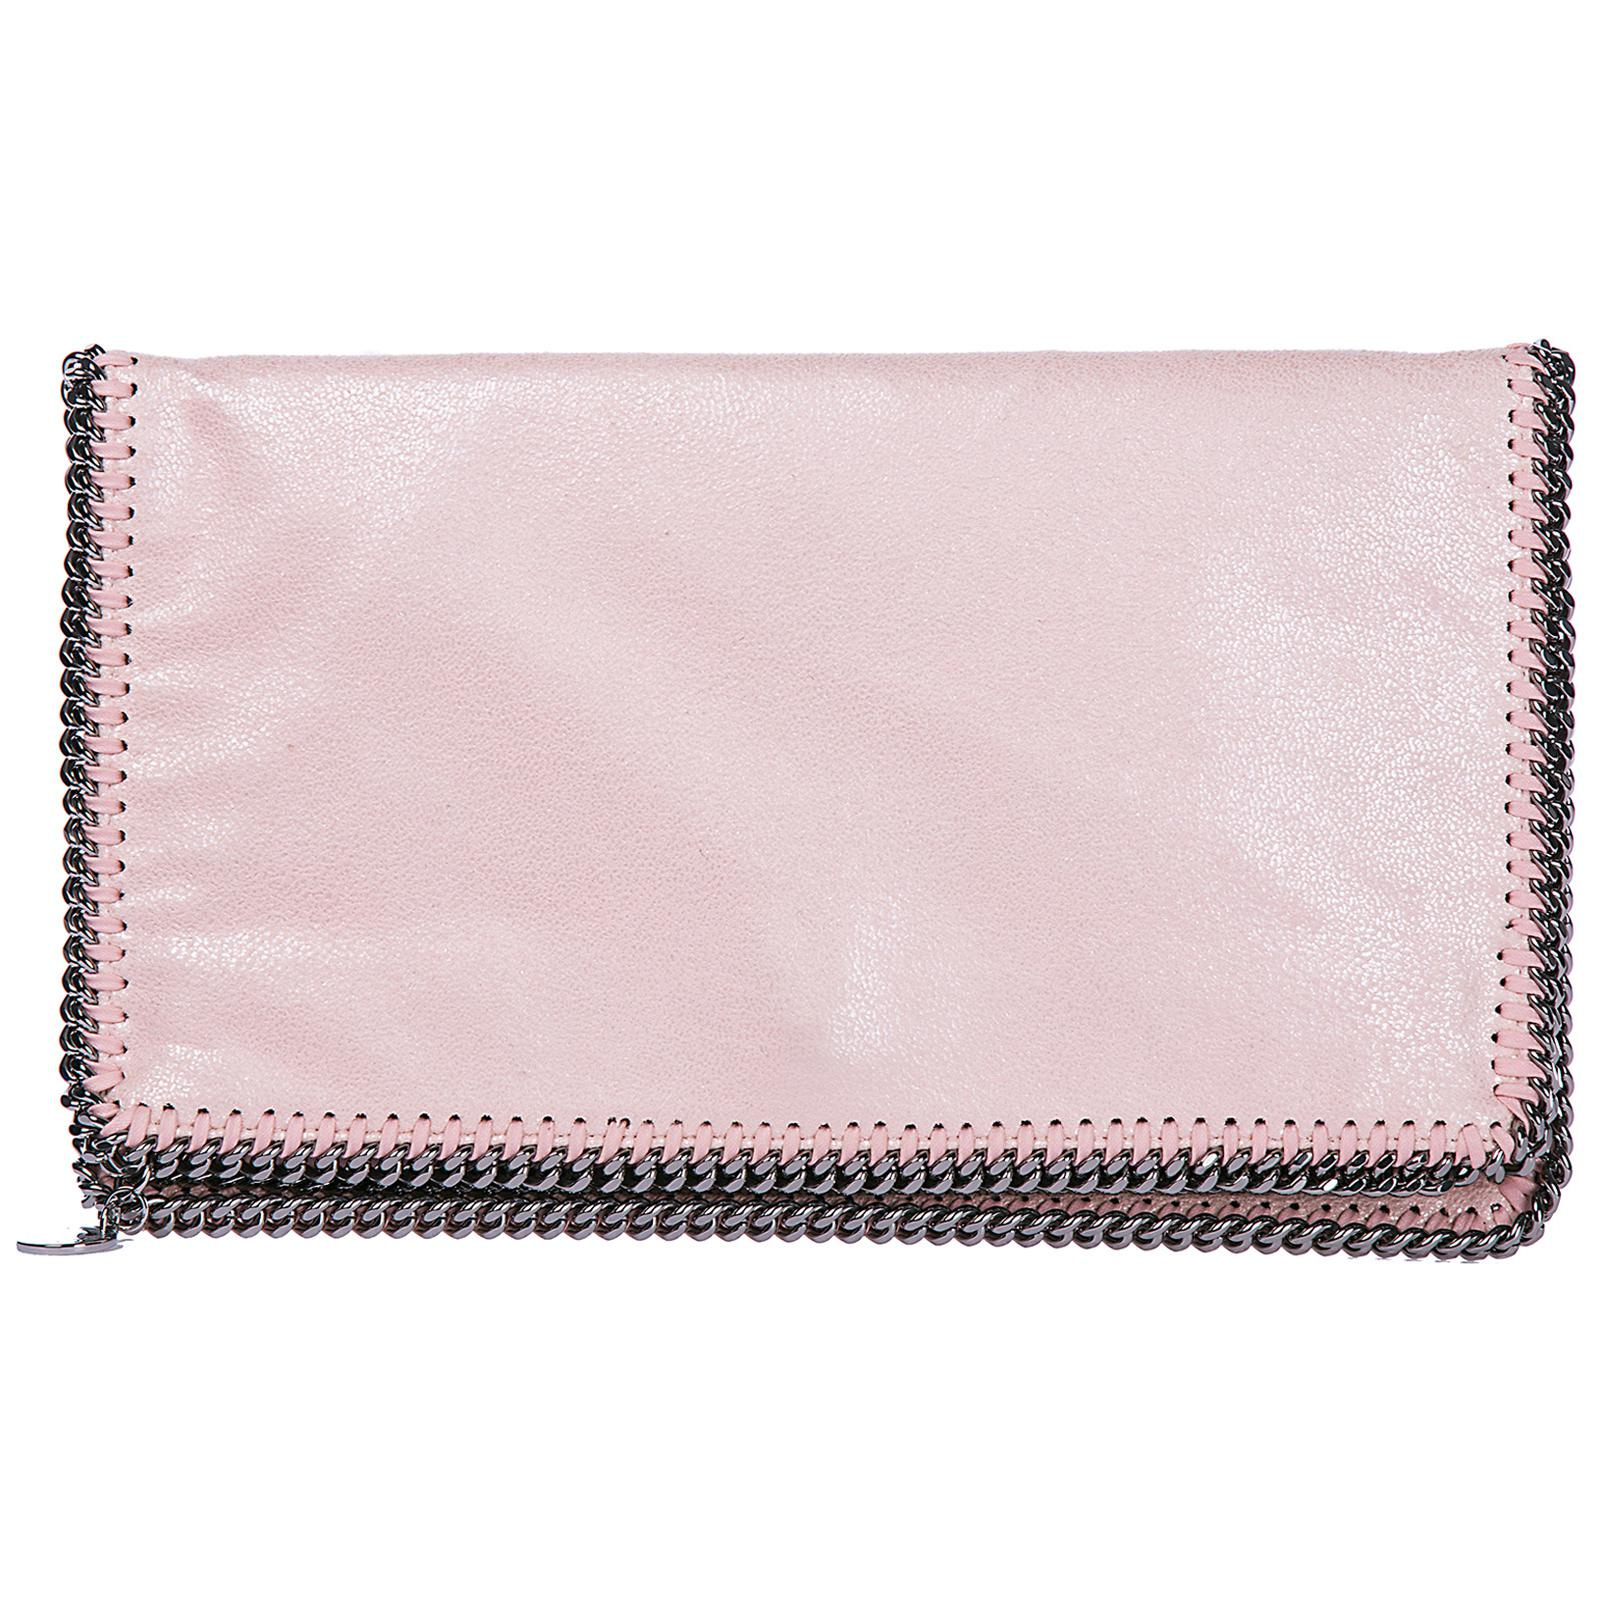 Stella McCartney. Women s Pink Clutch Handbag Bag Purse Falabella Fold Over shaggy  Deer 1a81c8337ce2a